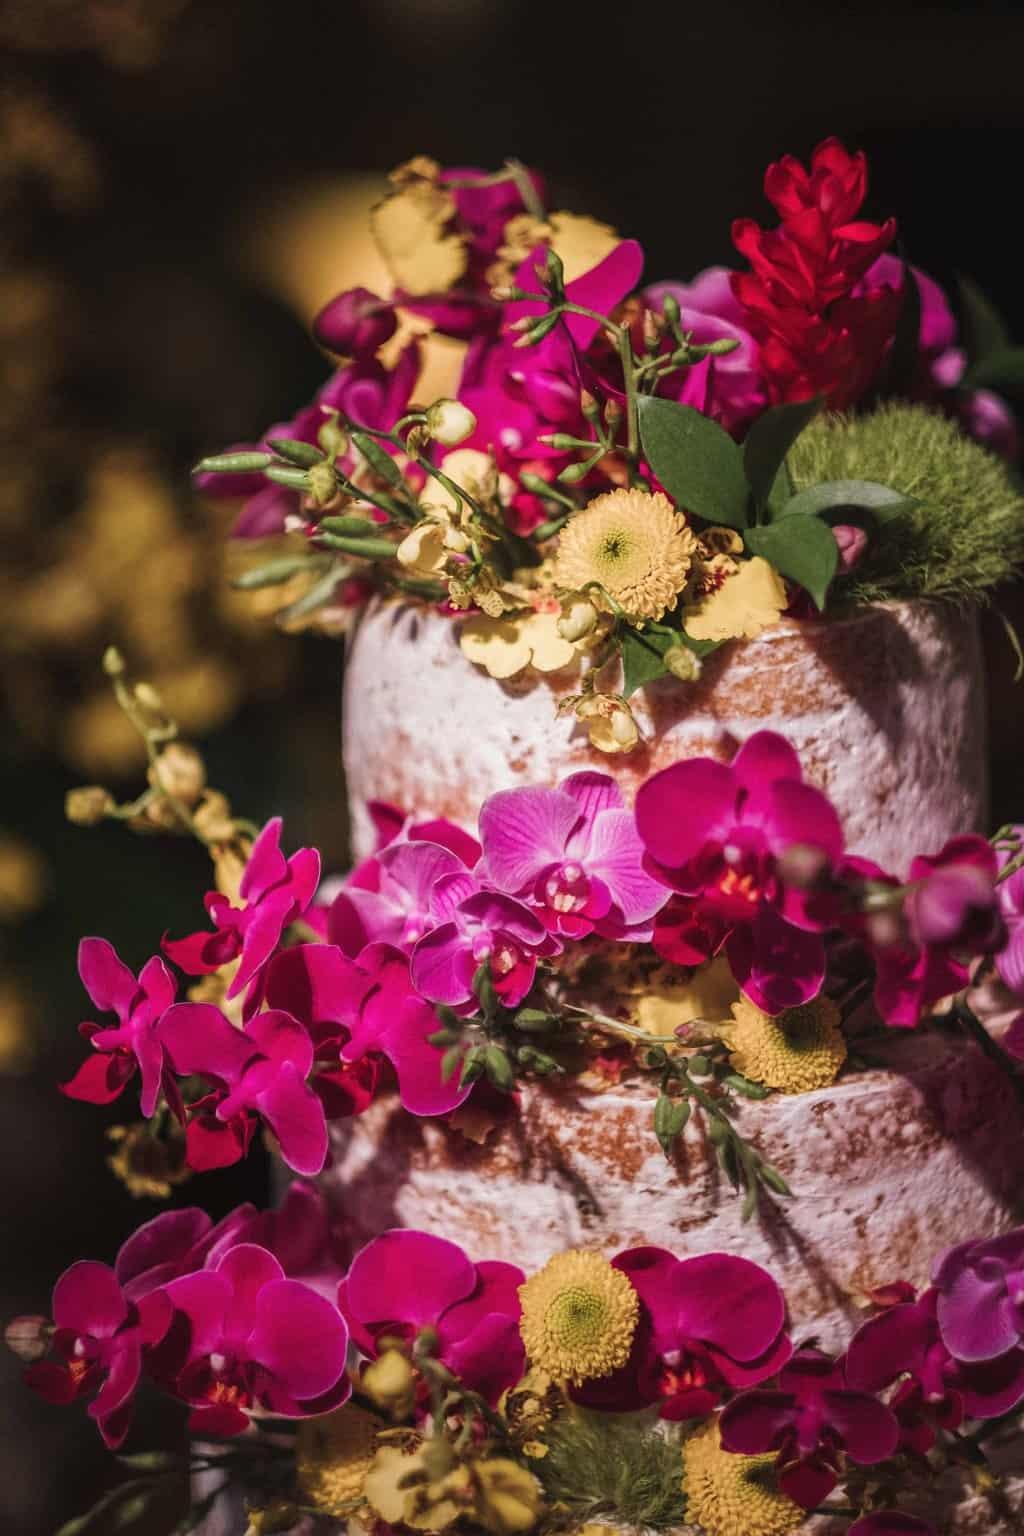 bolo-de-casamento-casamento-na-serra-Fotografia-Renata-Xavier-Les-Amies-Cerimonial-Locanda-Della-Mimosa-mesa-de-doces-Natalia-e-Bruno545